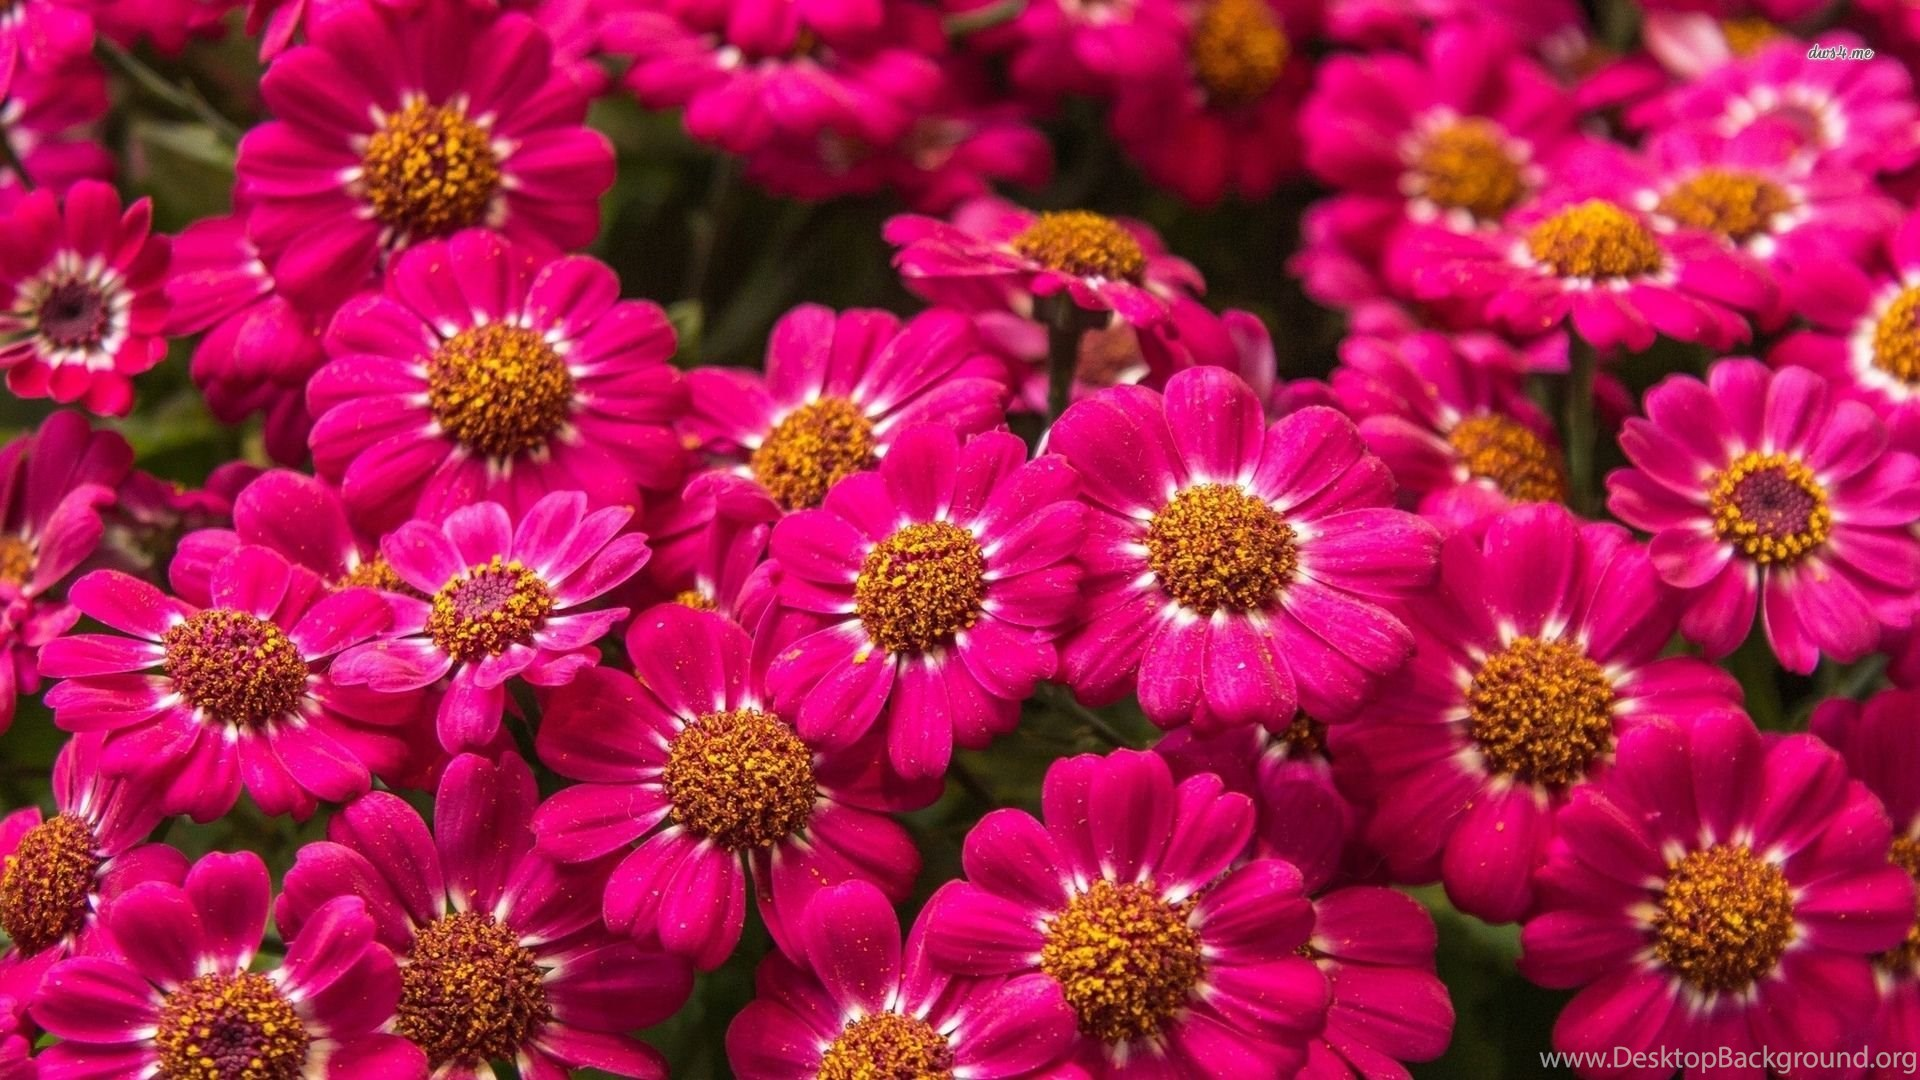 30 amazing free hd flower wallpapers desktop background